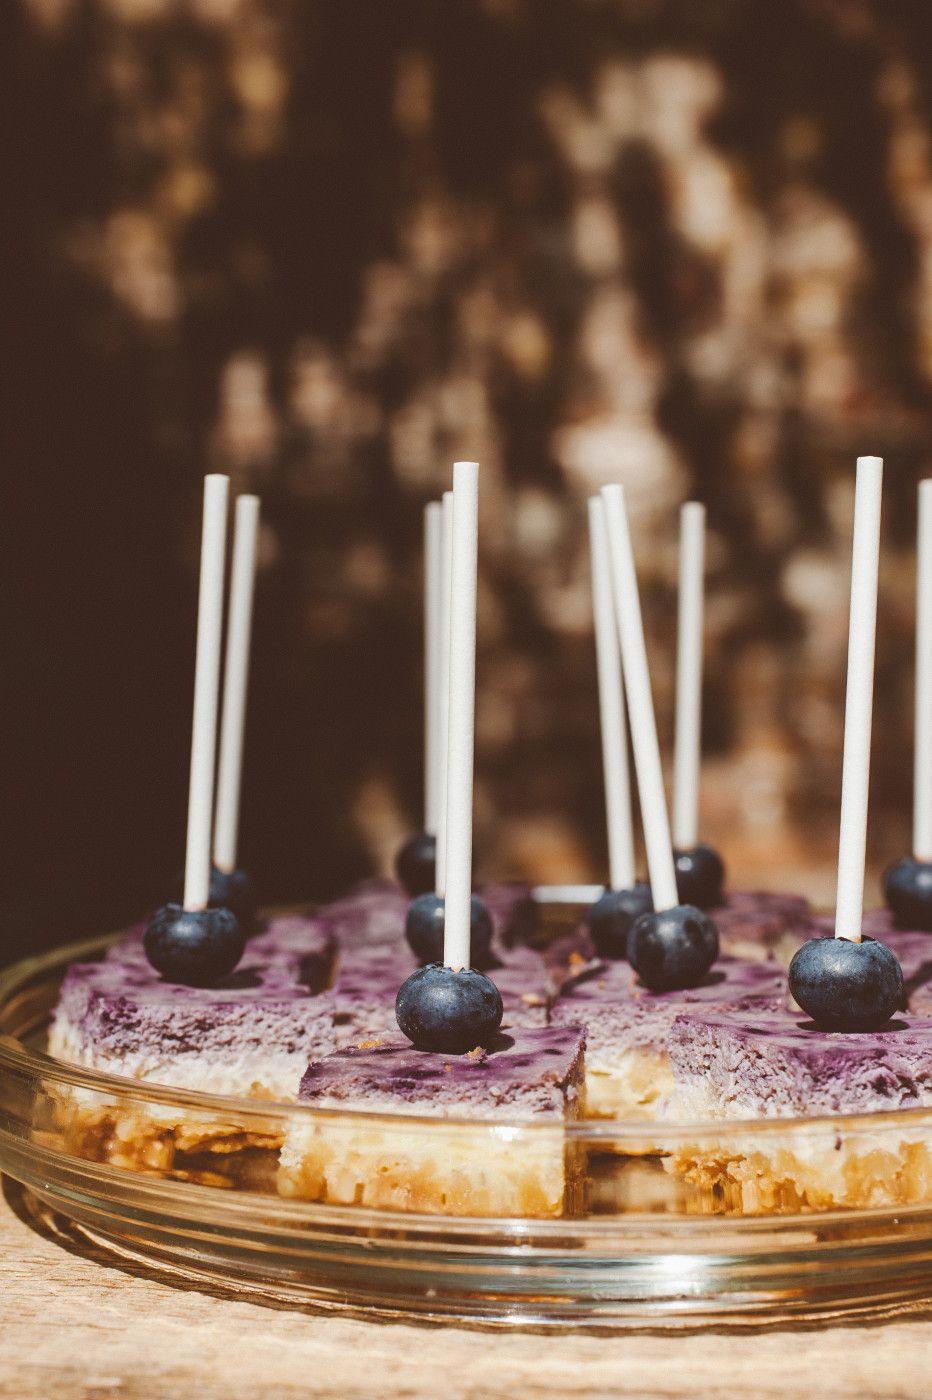 Mini Blueberry Cheesecake & Rose Cookies Fotocredit: Katinka Stone